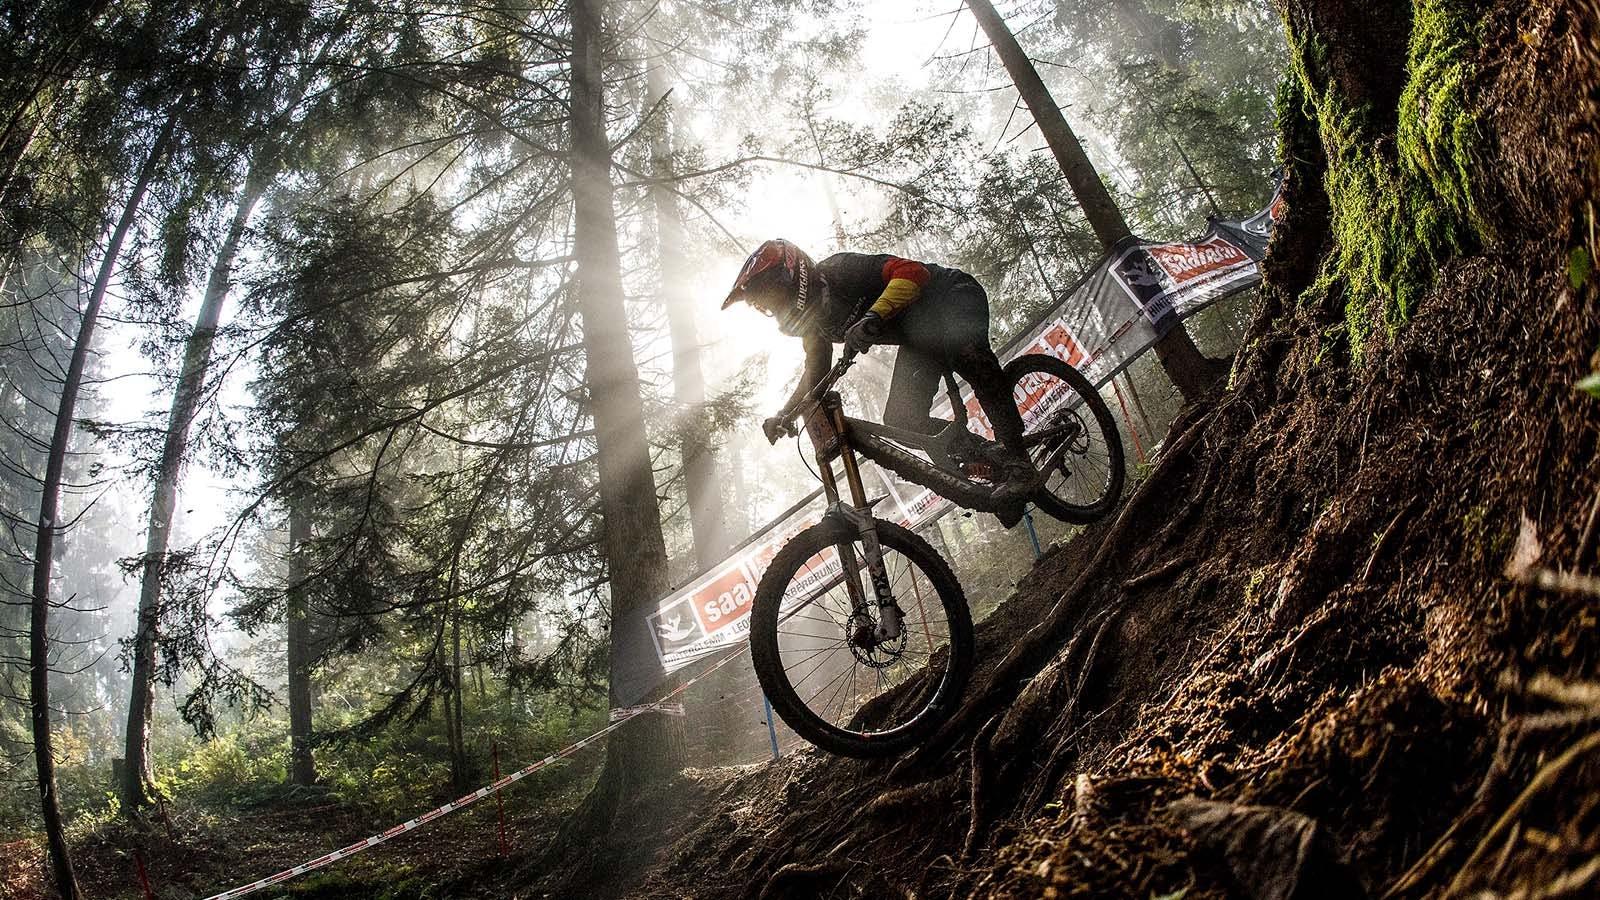 Nina Hoffman racing her downhill bike